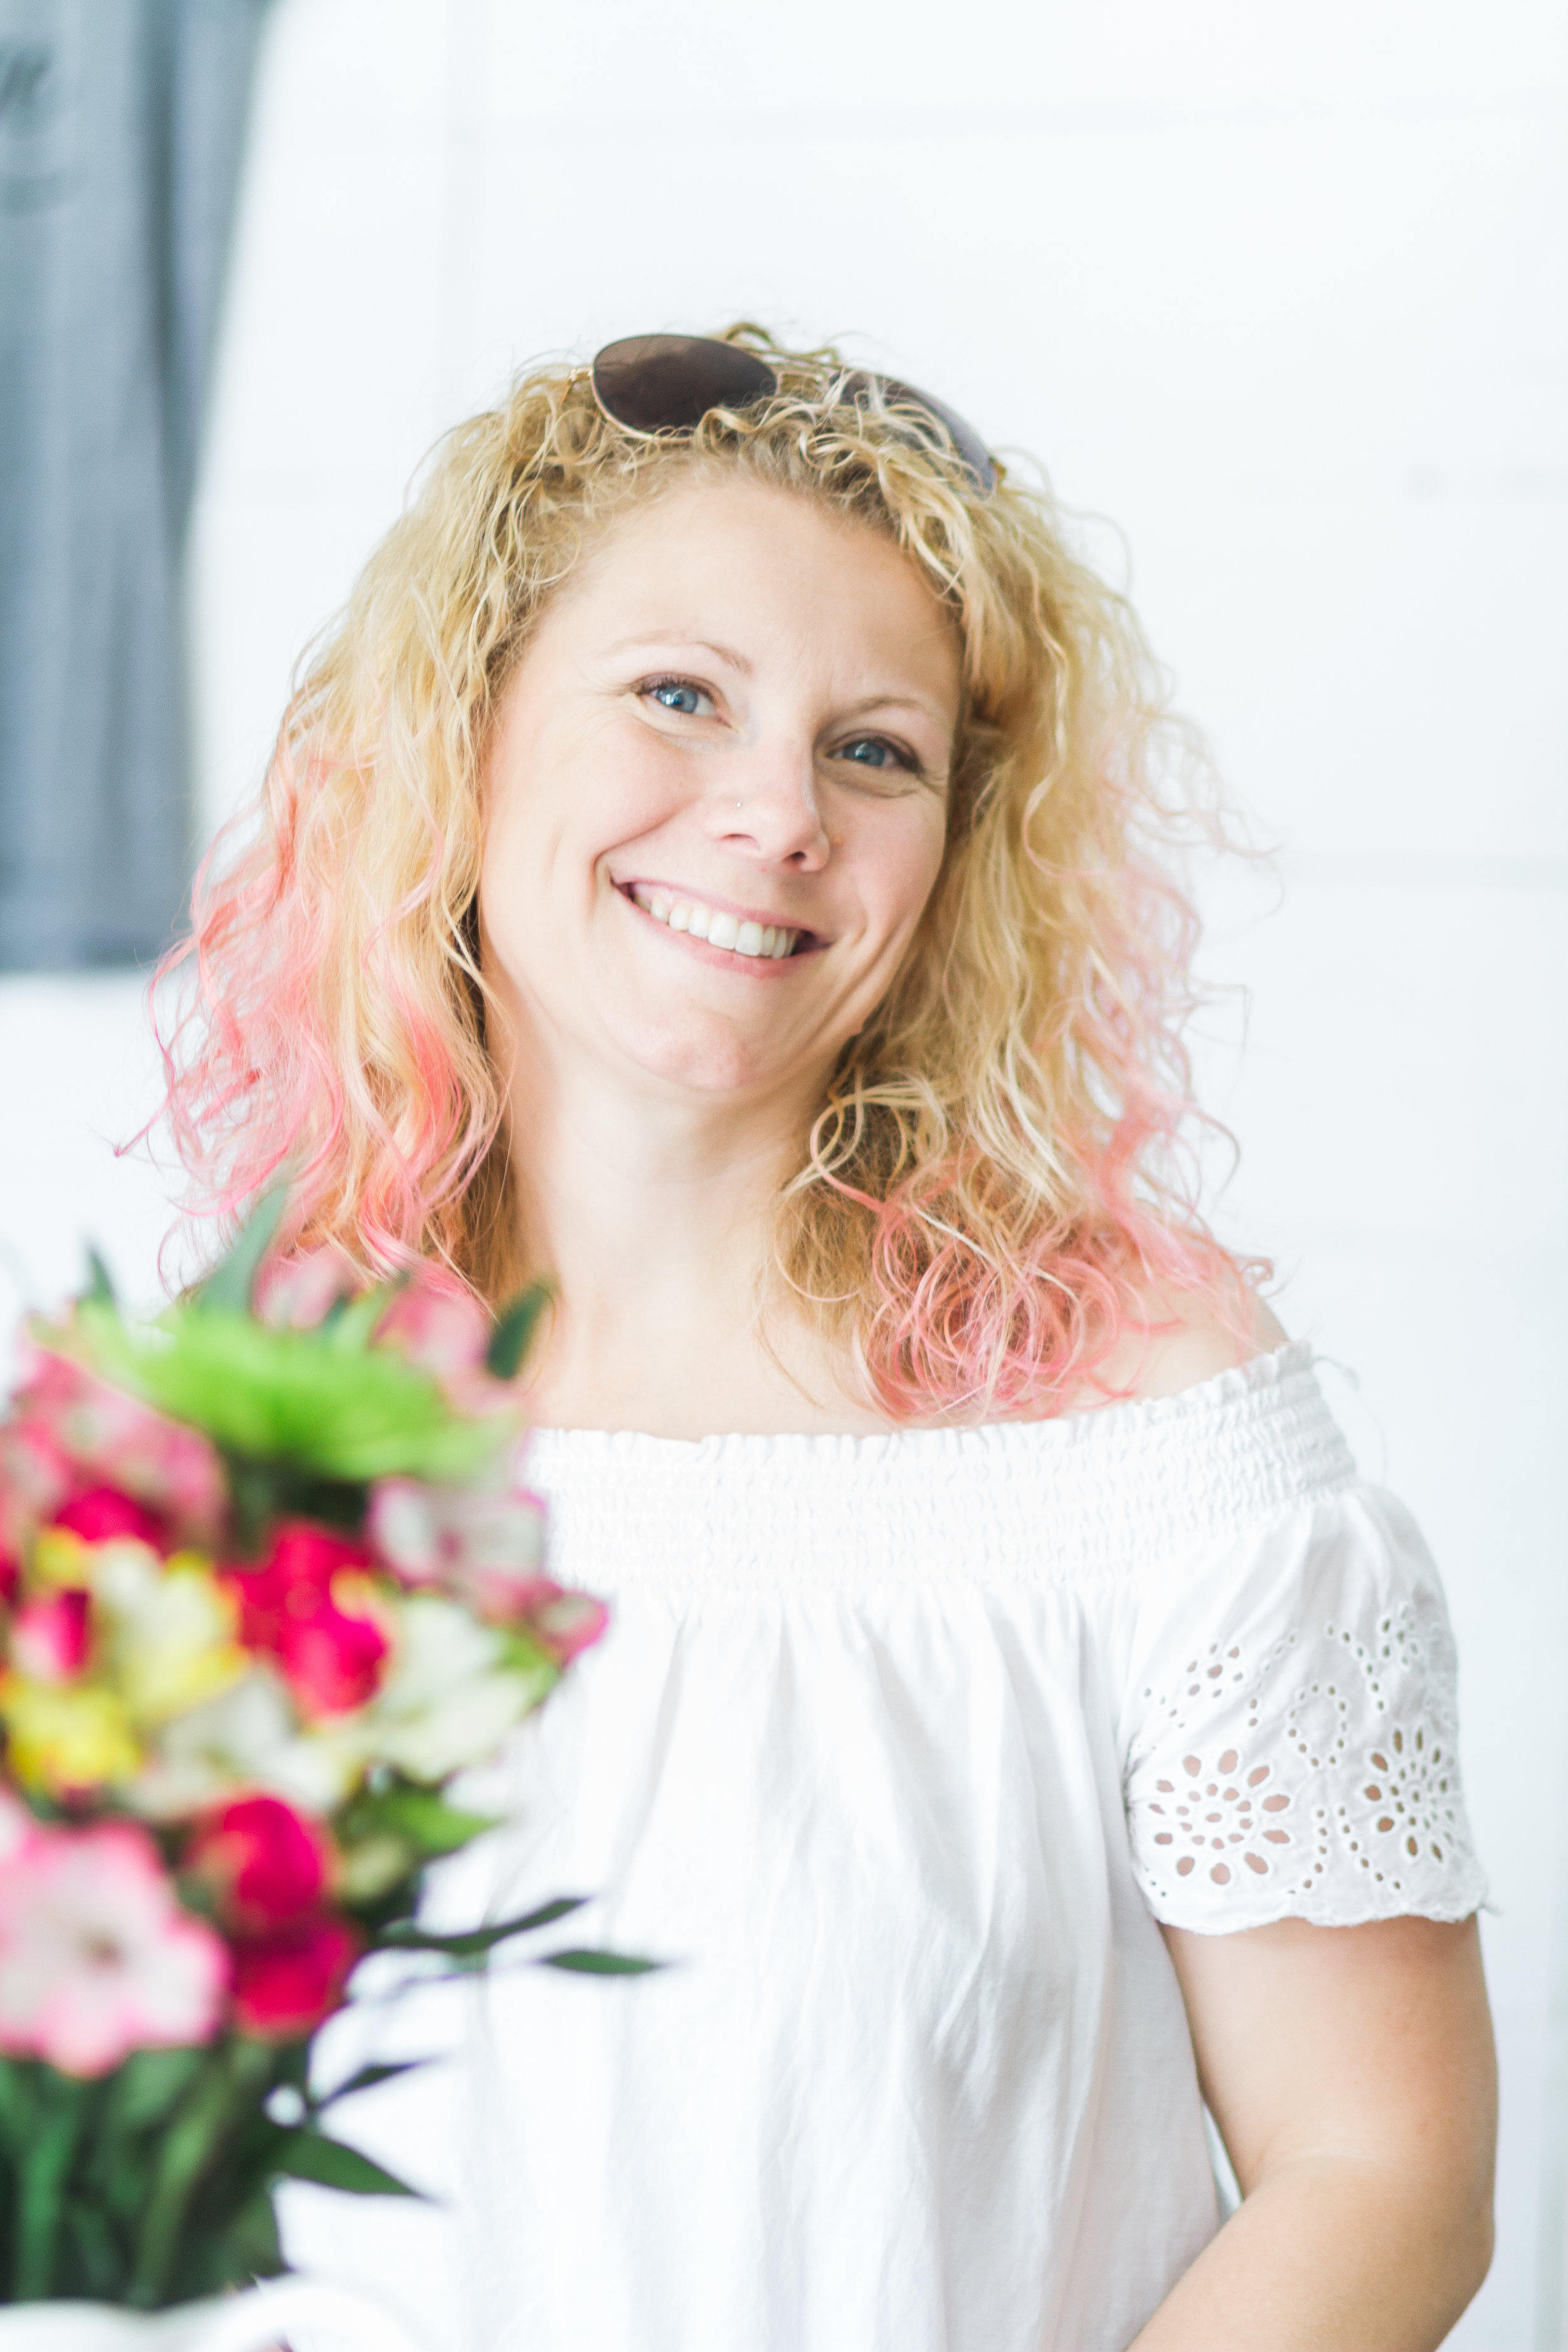 Personal Branding Photographer Small Business Marketing Photography Scituate Massachusetts Newington Connecticut Shannon Sorensen